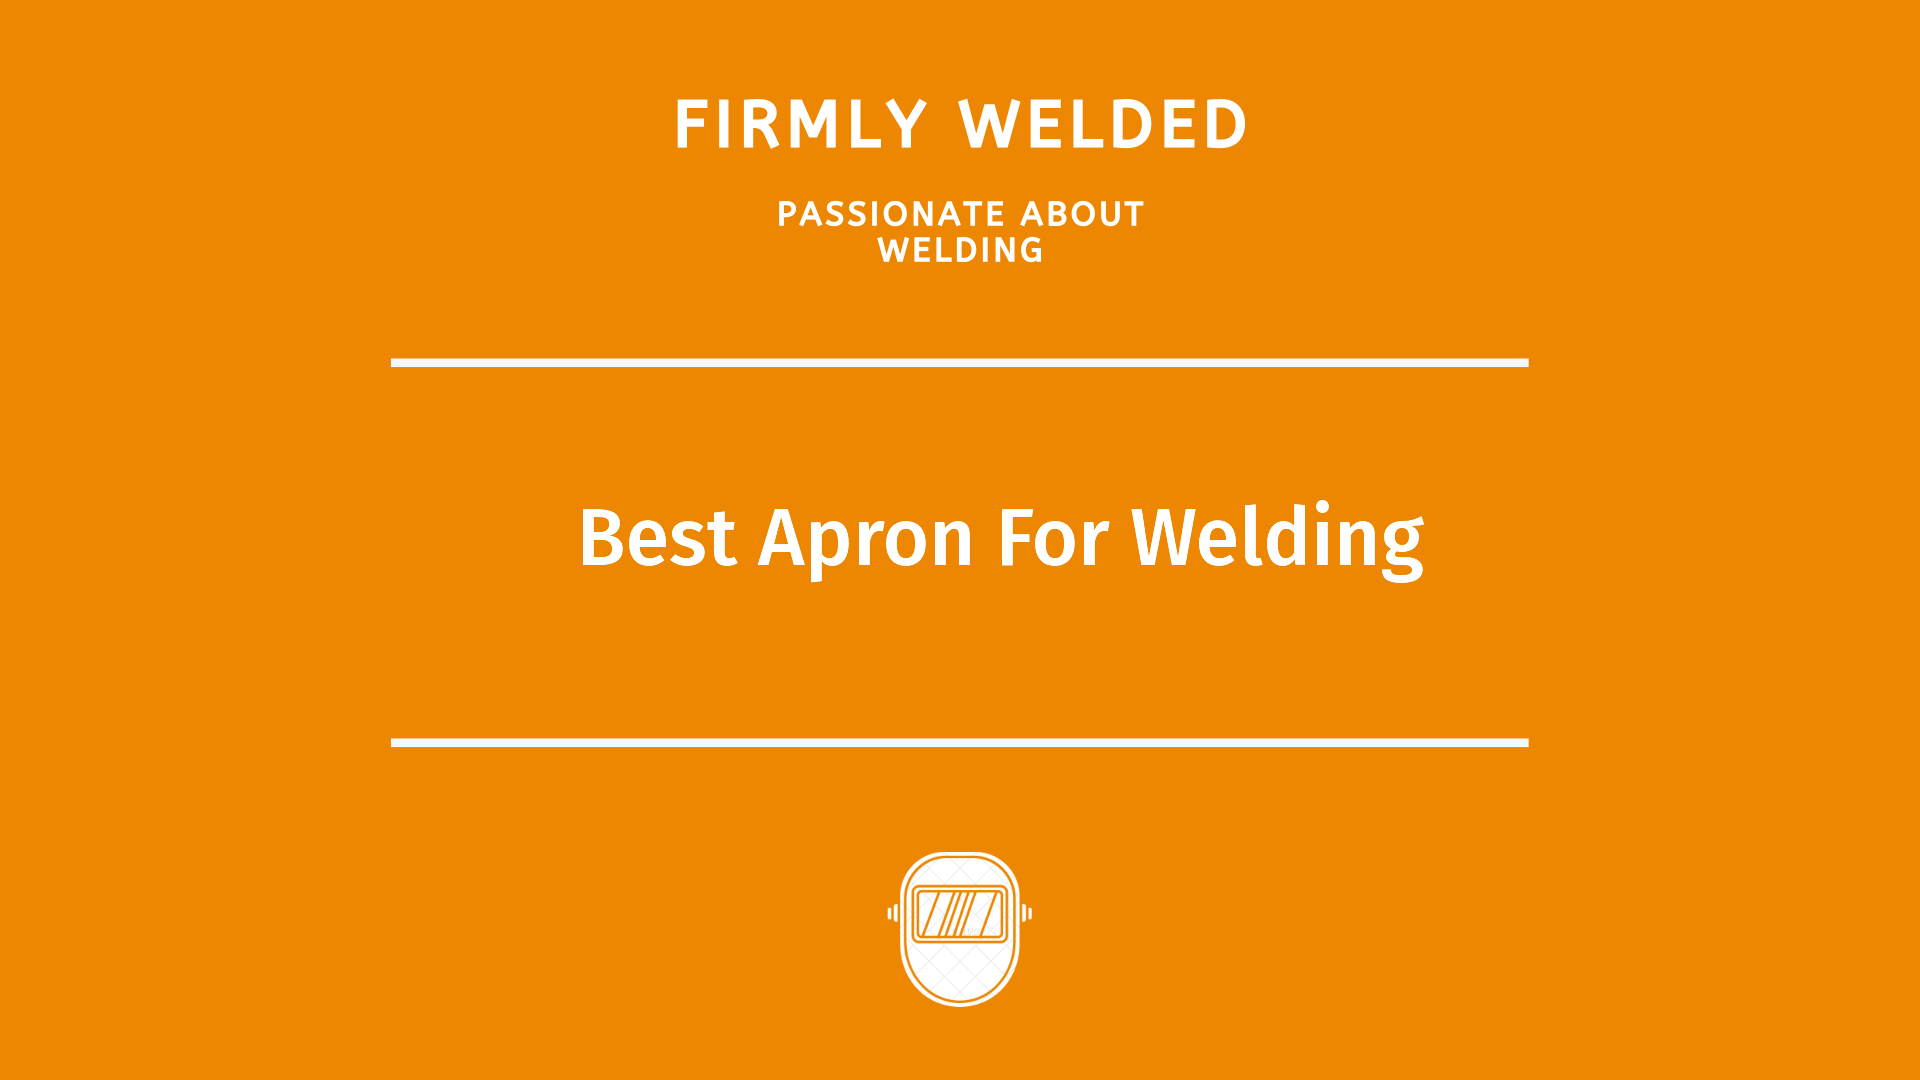 Best Apron For Welding